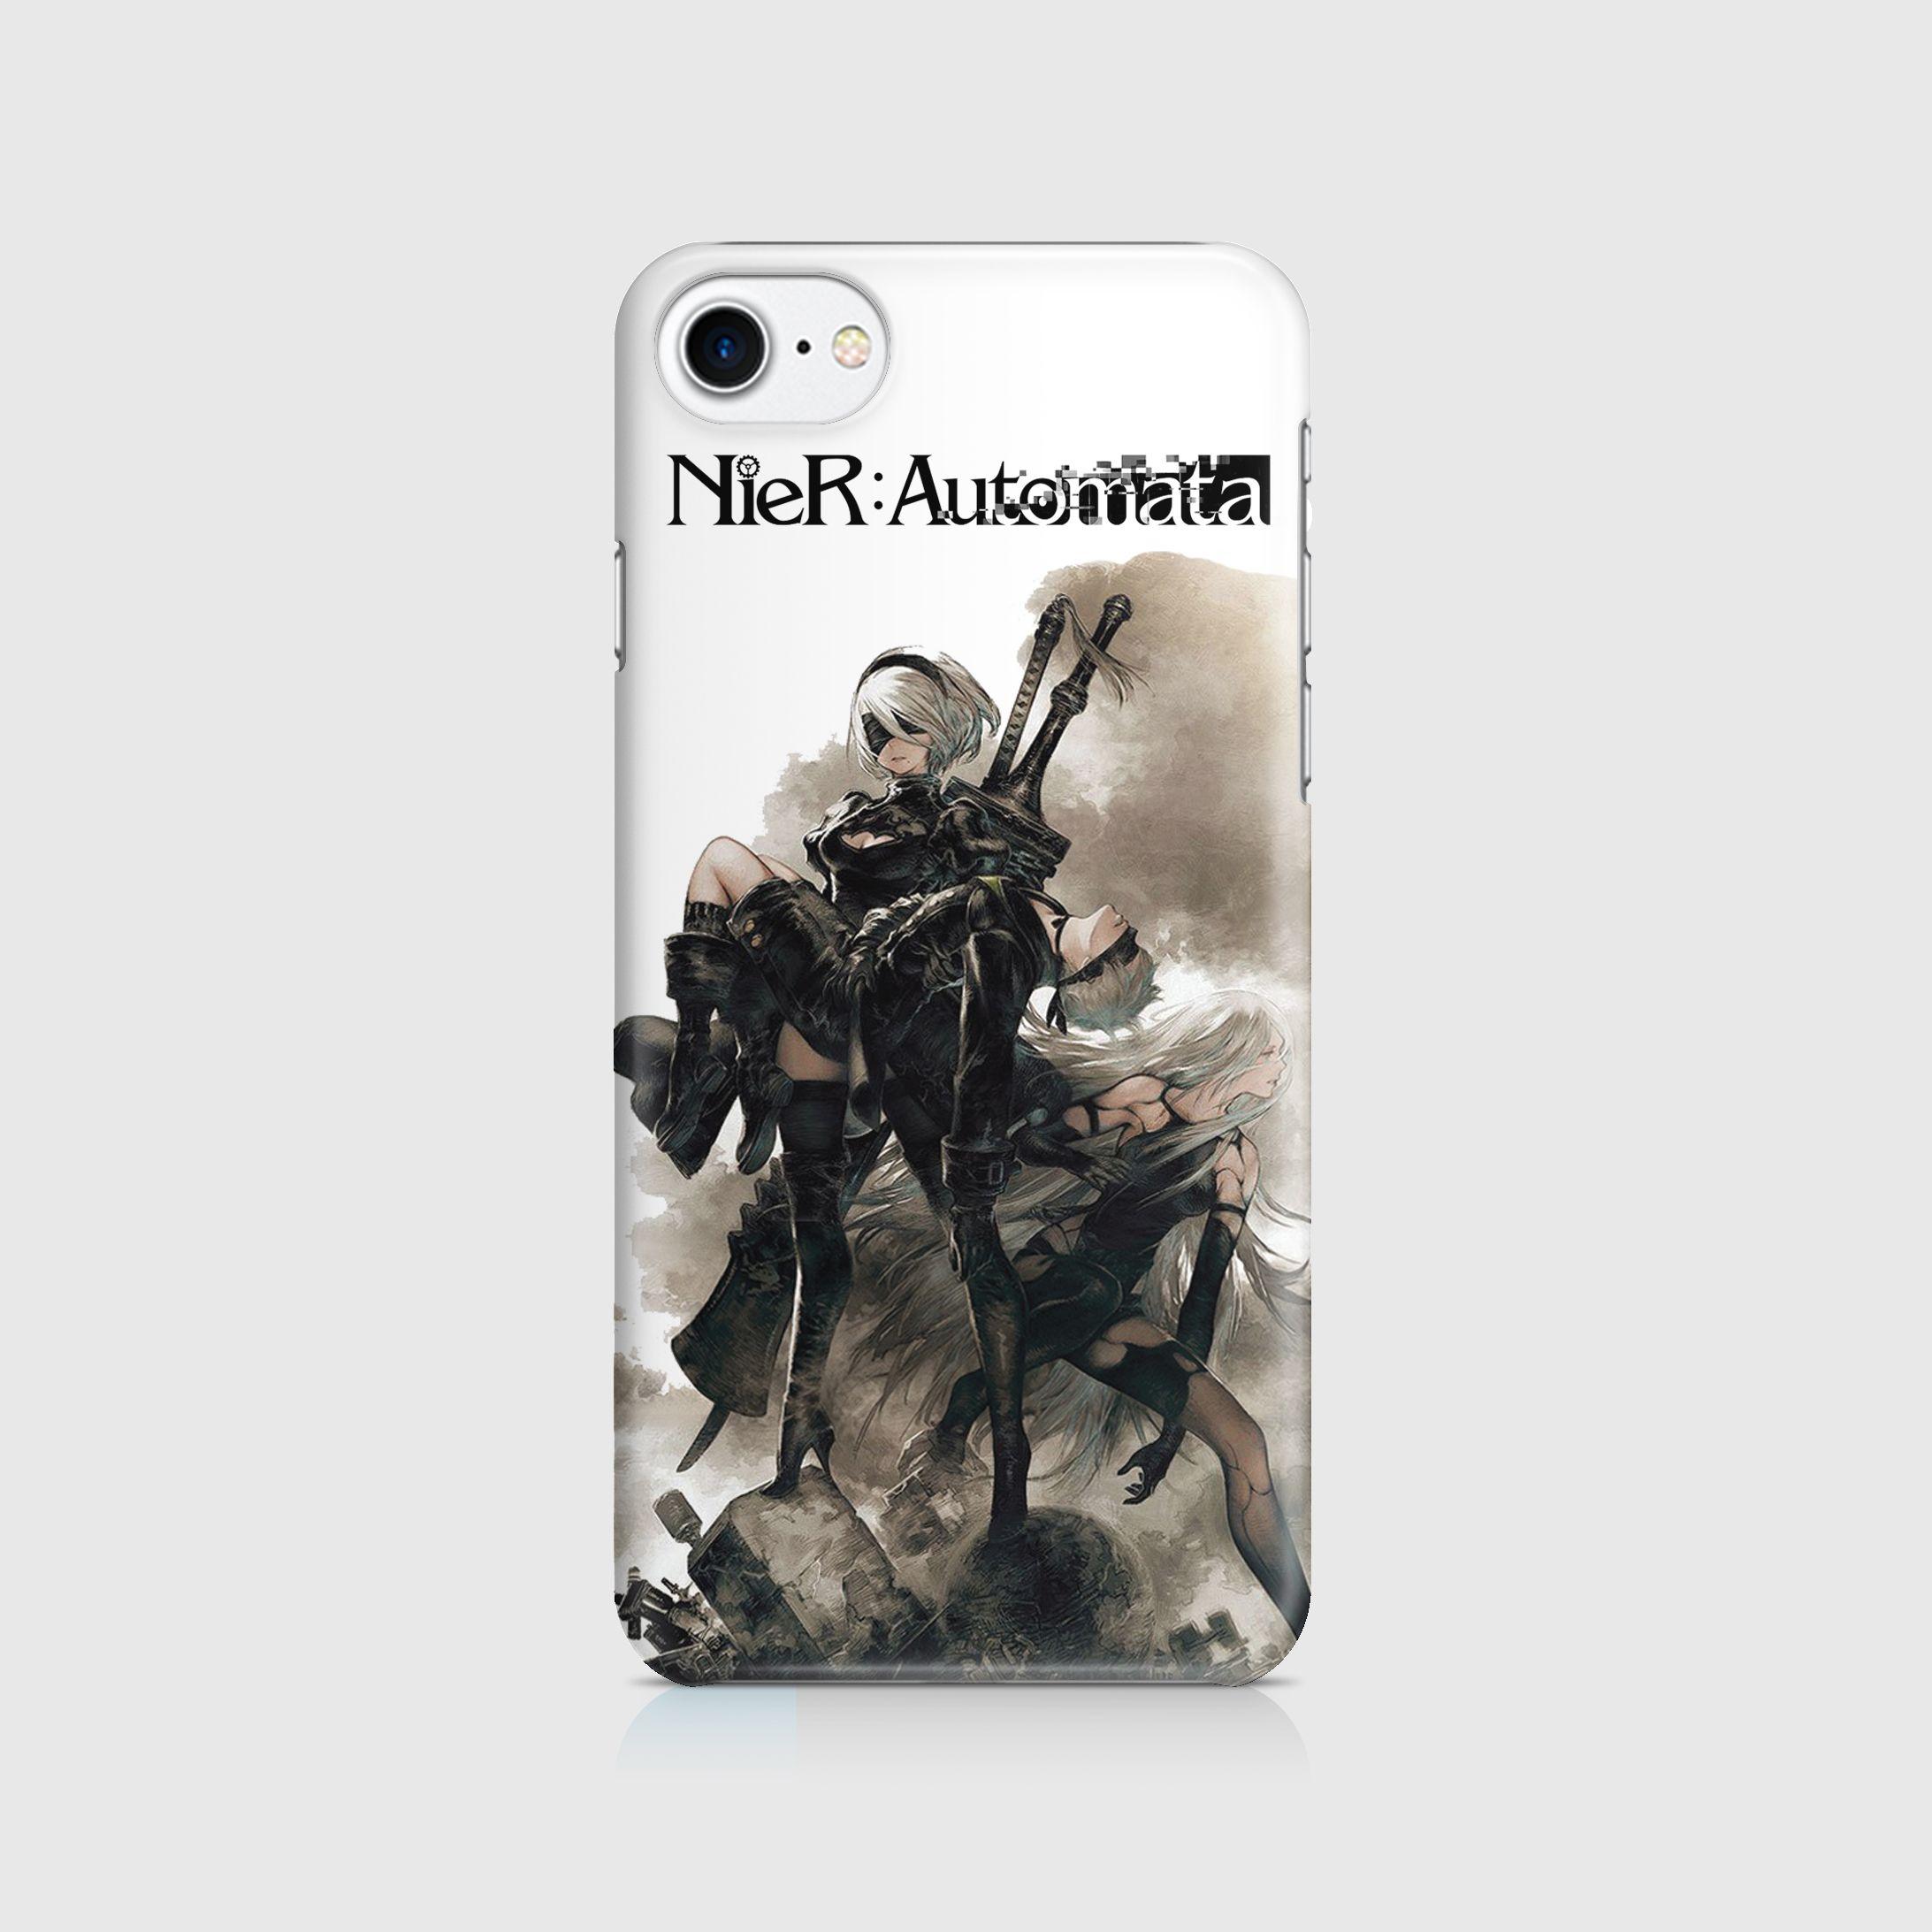 Nier Automata 2B Art Work Phone Case / Cover Iphone